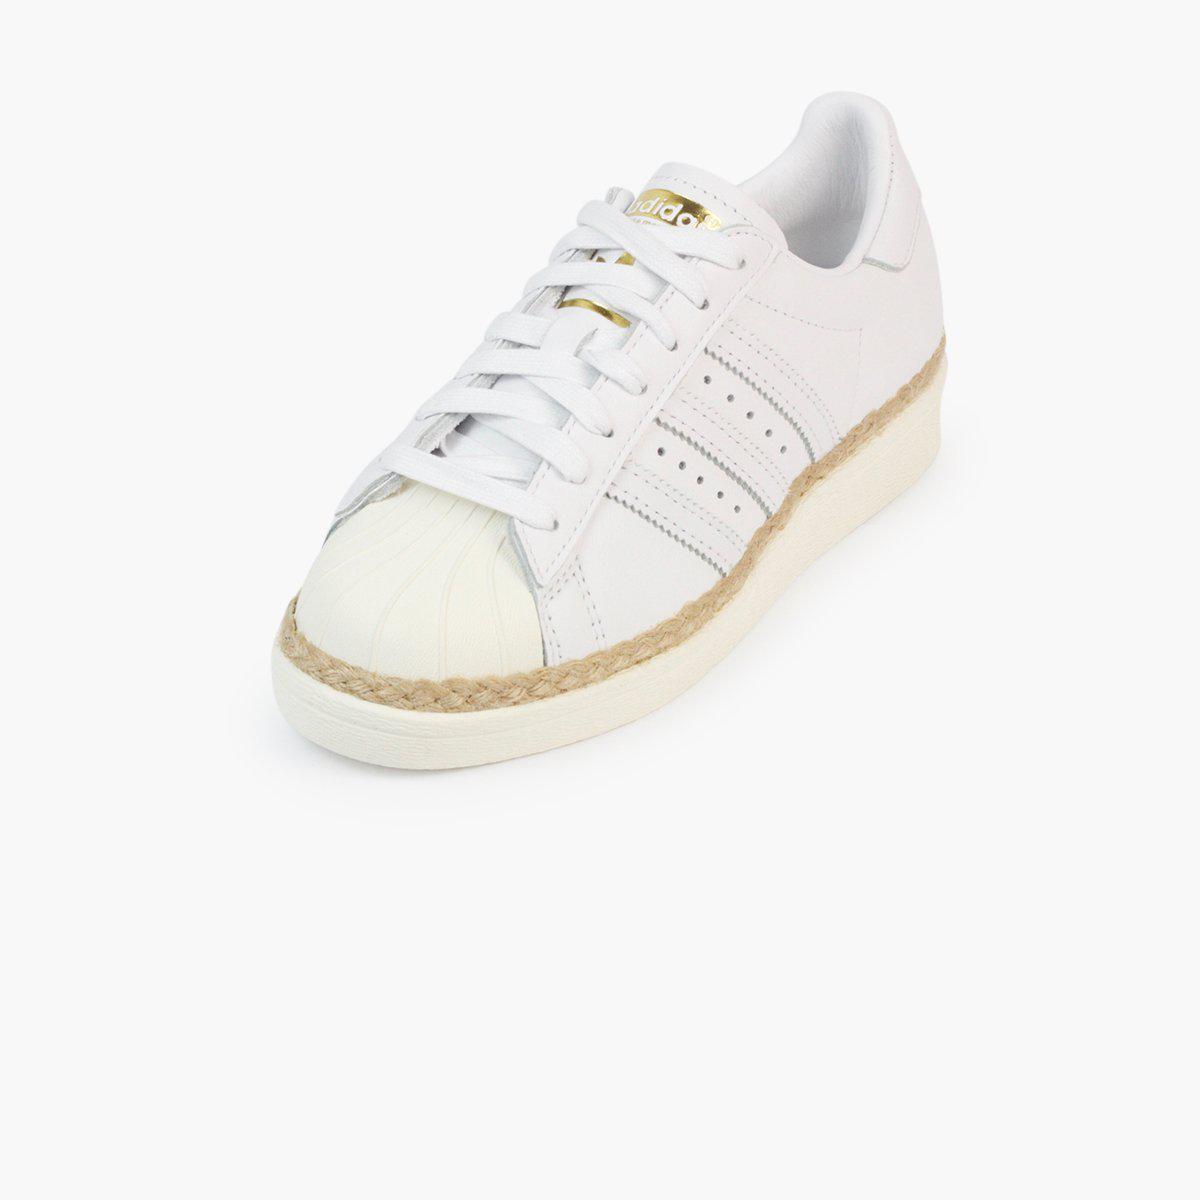 7631c8c46477 Adidas Originals - White 80 s New Bold Women s - Lyst. View fullscreen